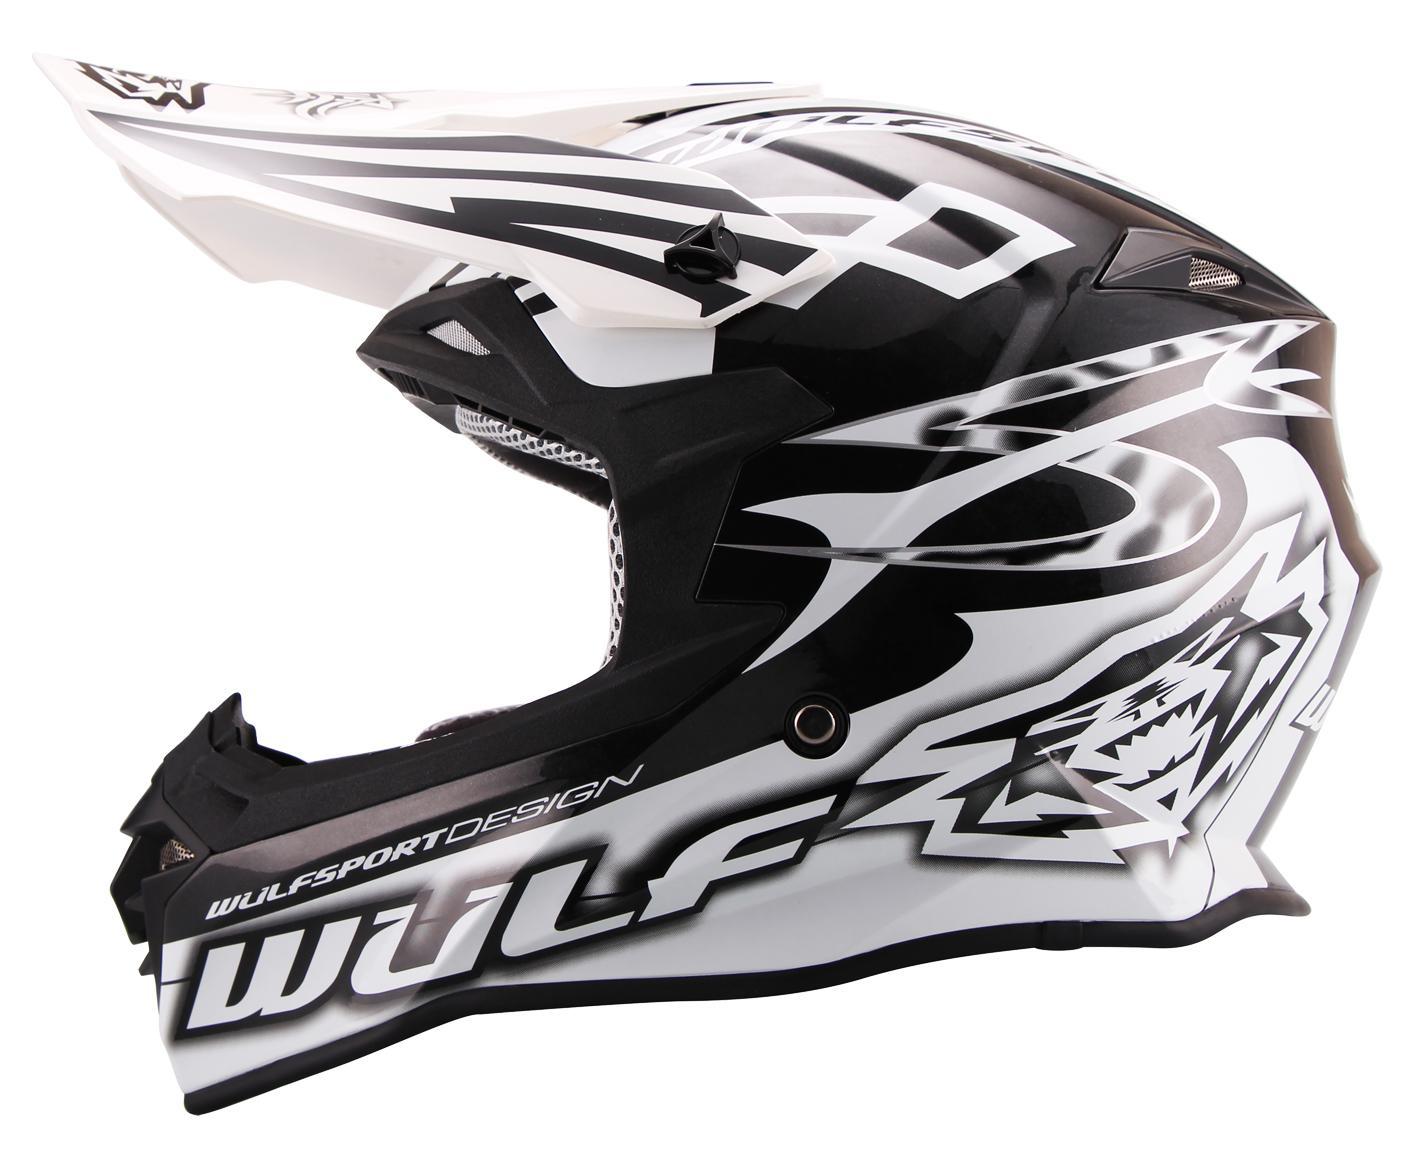 weiss Motorrad Quad Bike Enduro MX BMX Wulfsport Cross Helm Sceptre M 57-58cm